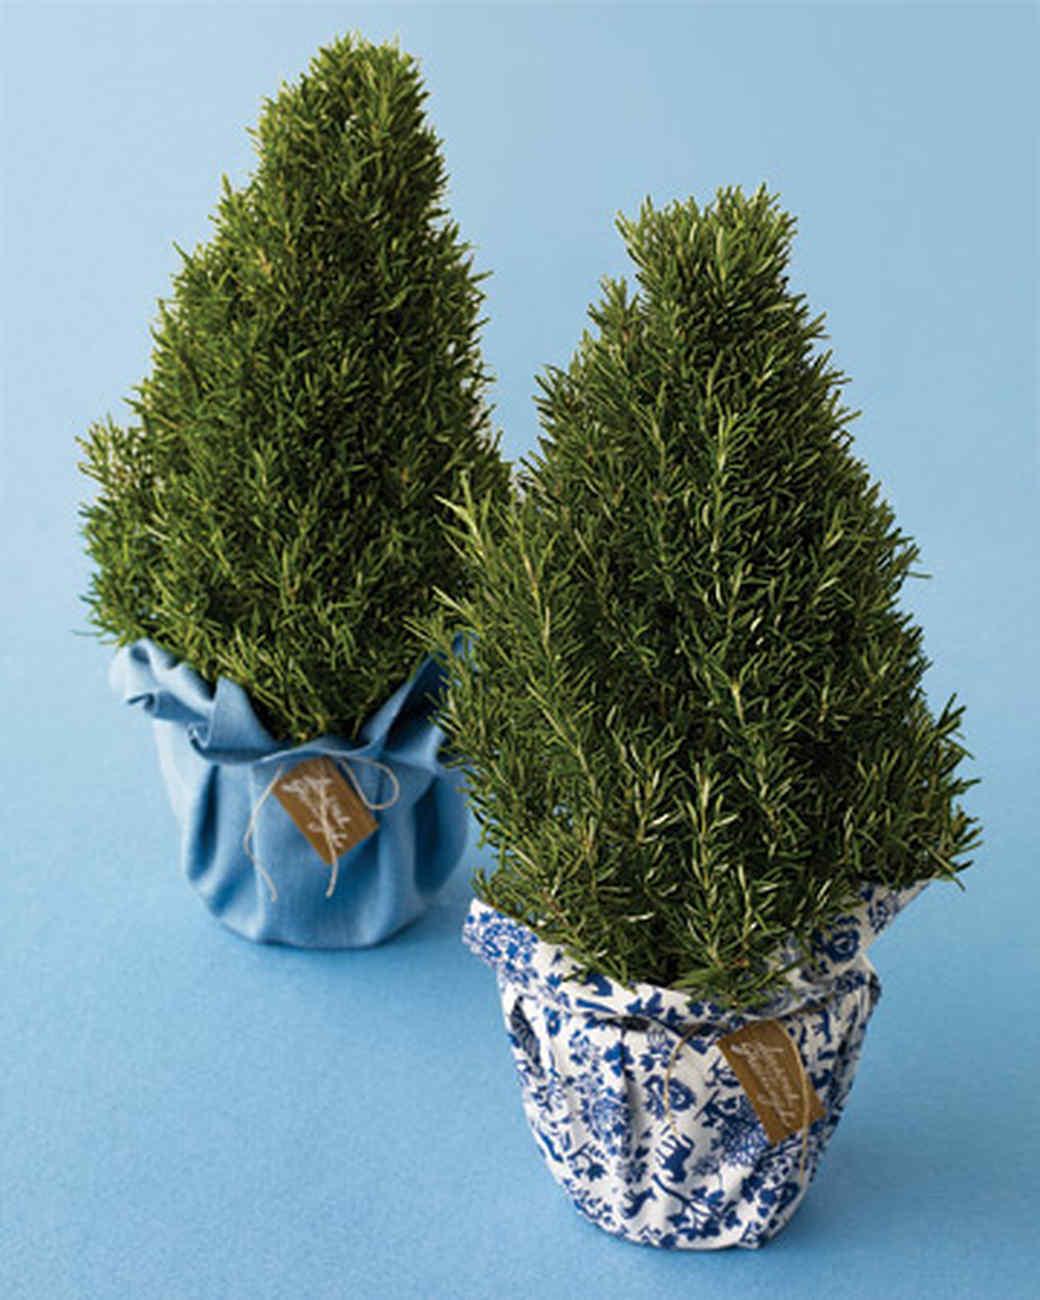 holiday hostess gift ideas | martha stewart